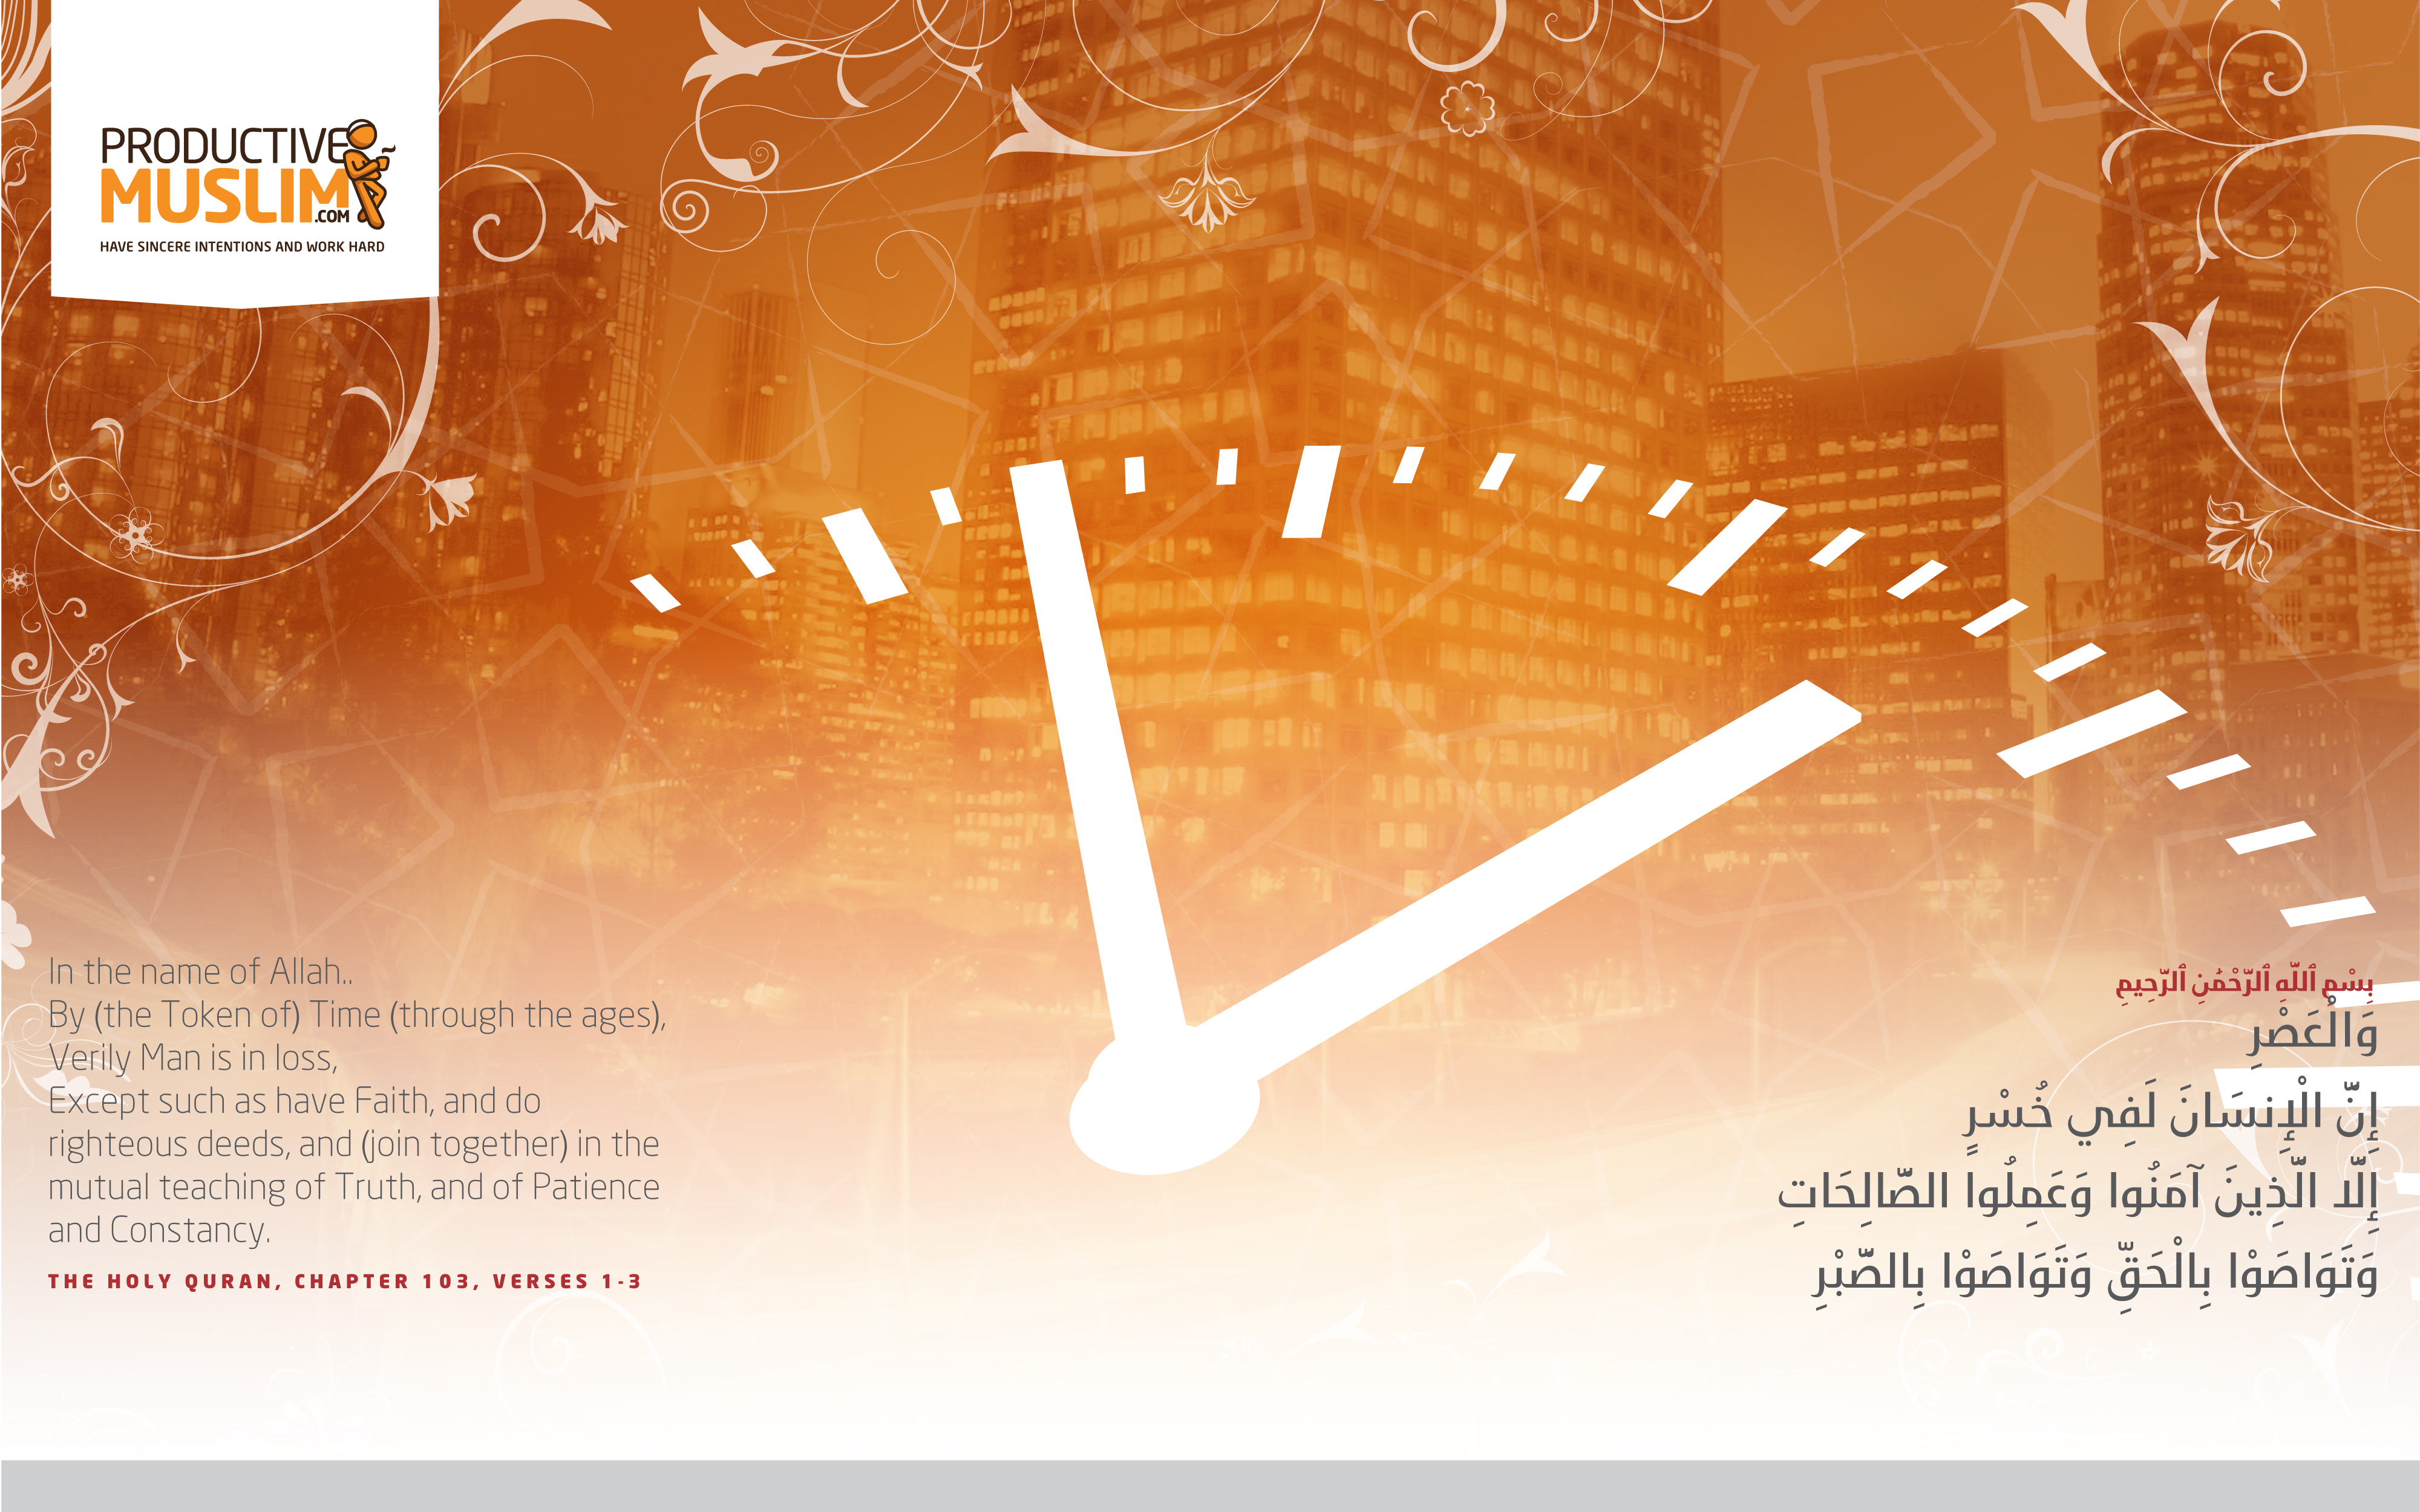 http://www.productivemuslim.com/wp-content/uploads/Wallpapers/wallpapers/ProductiveMuslim-Wallpaper-WalAsr-R4-01.jpg